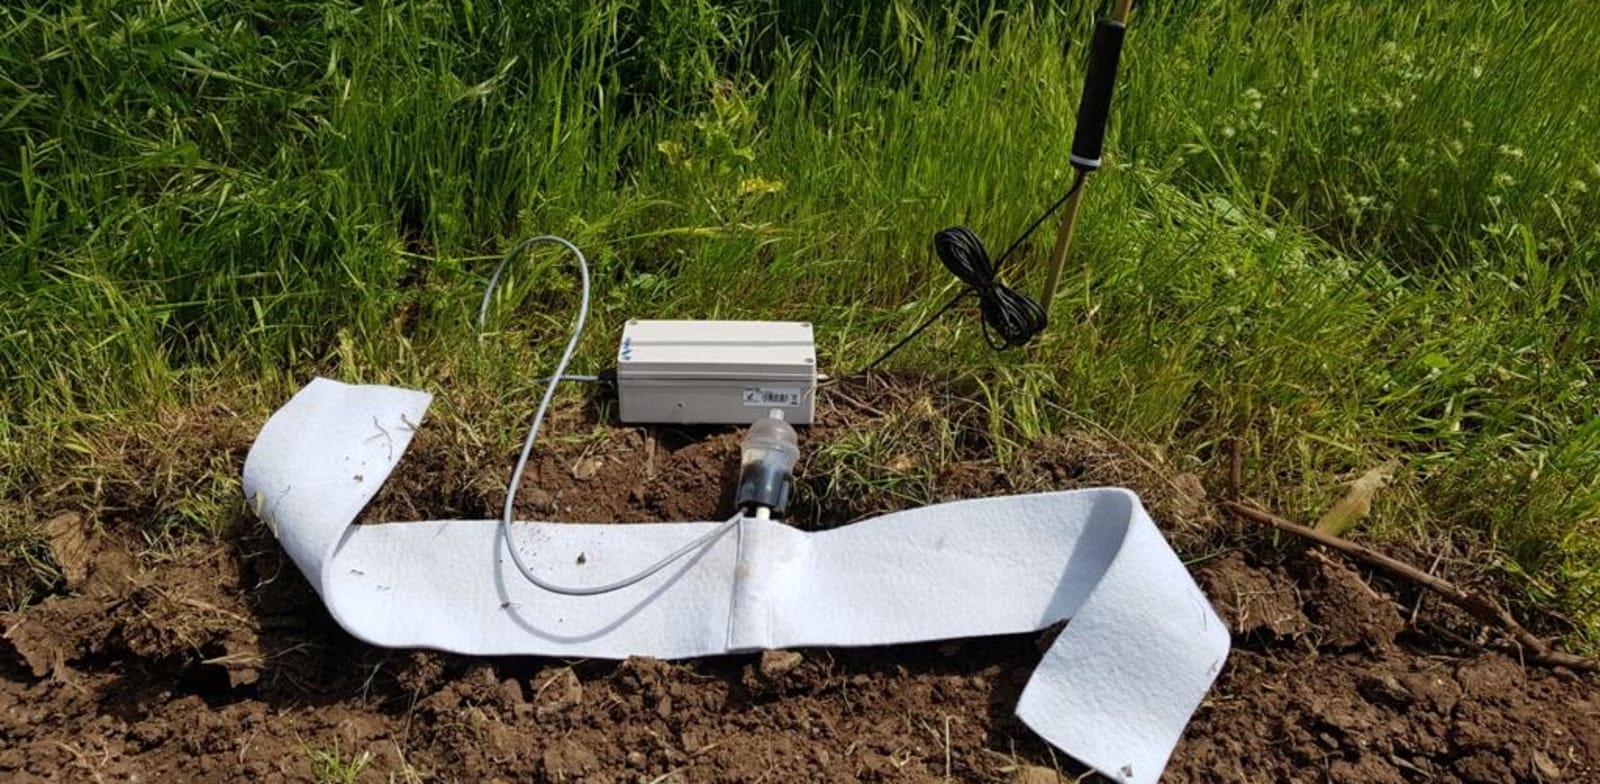 NDrip irrigation system  credit: NDrip